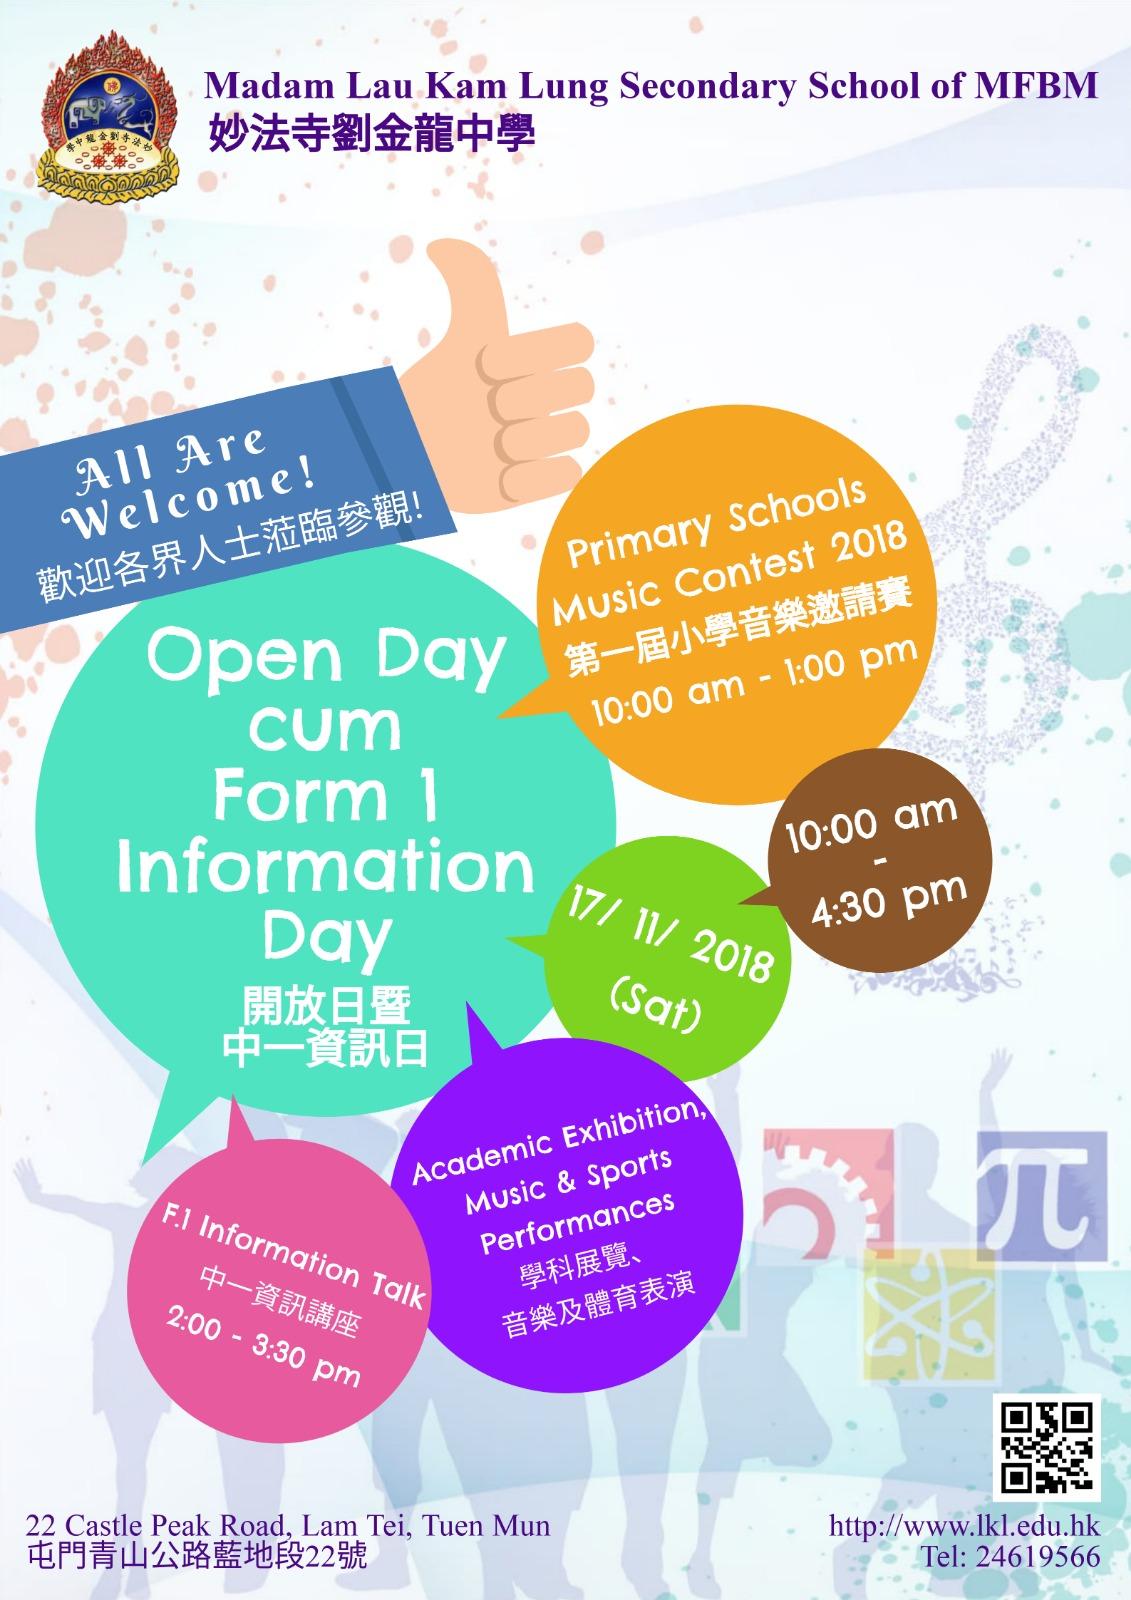 http://www.lkl.edu.hk/it-school/php/webcms/files/upload/tinymce///infotalk2018/poster_1538530383.jpg